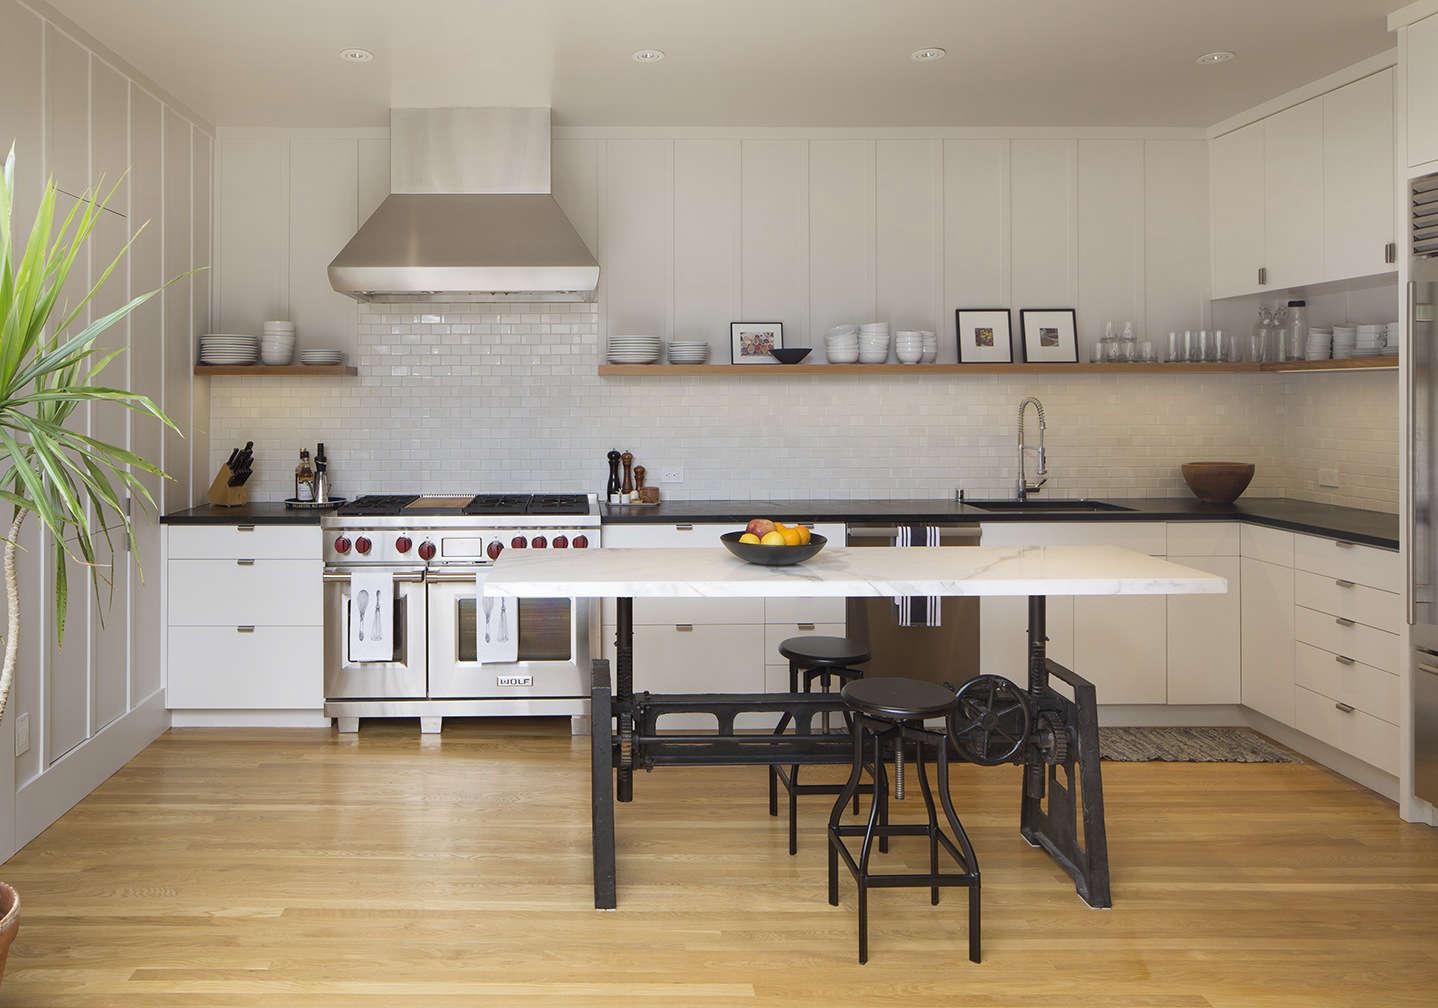 Board-and-batten SF kitchen remodel by Malcolm Davis Architecture